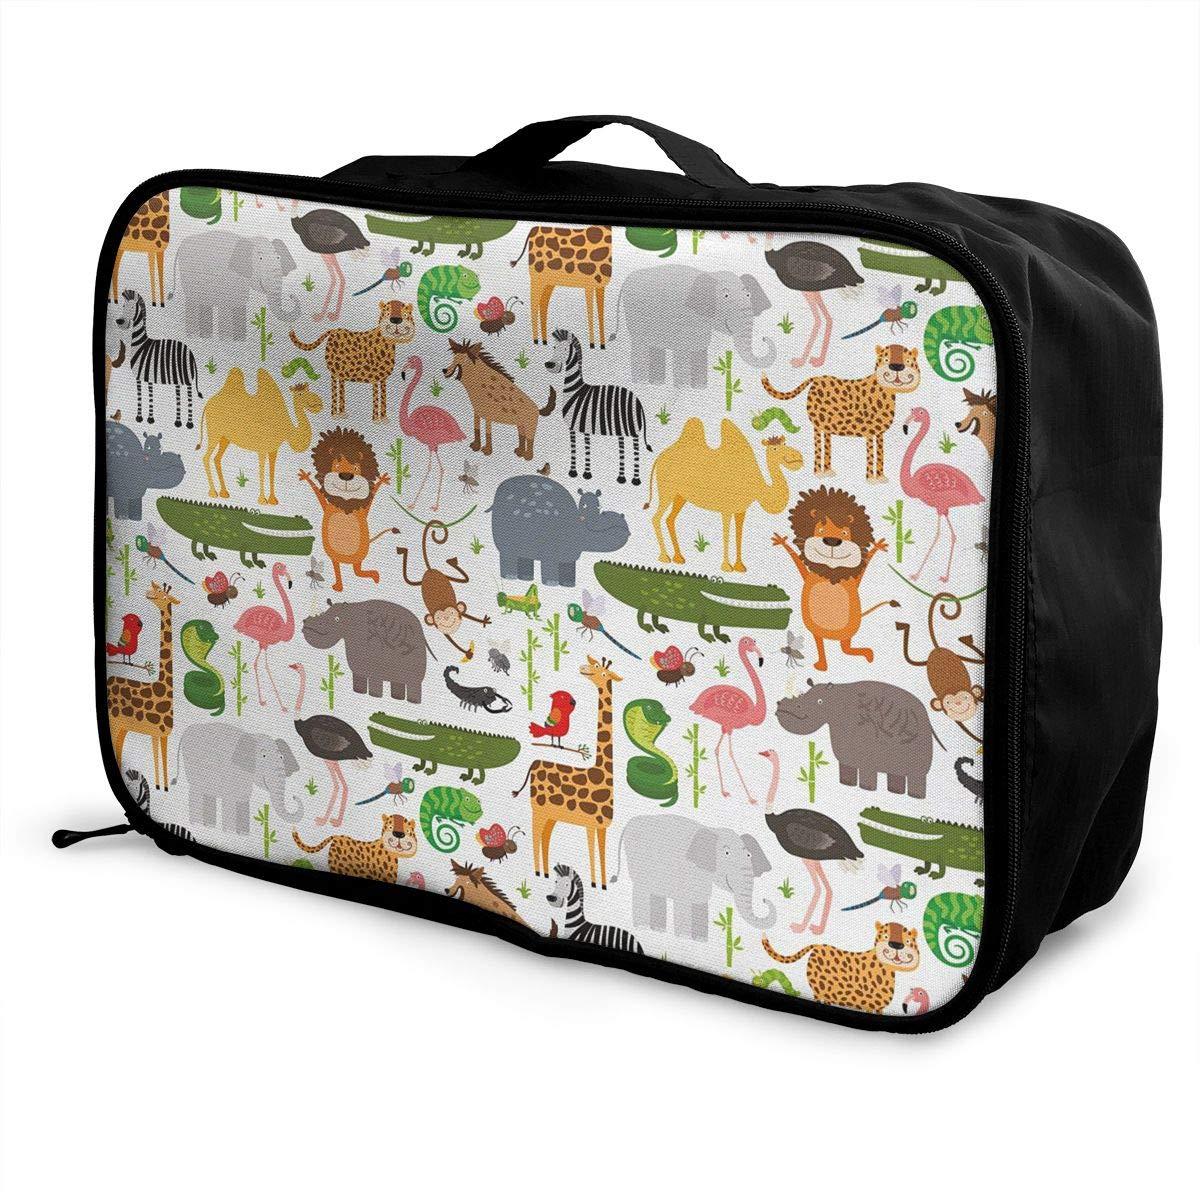 Children Cartoon Style Animal Canvas Travel Weekender Bag,Fashion Custom Lightweight Large Capacity Portable Luggage Bag,Suitcase Trolley Bag